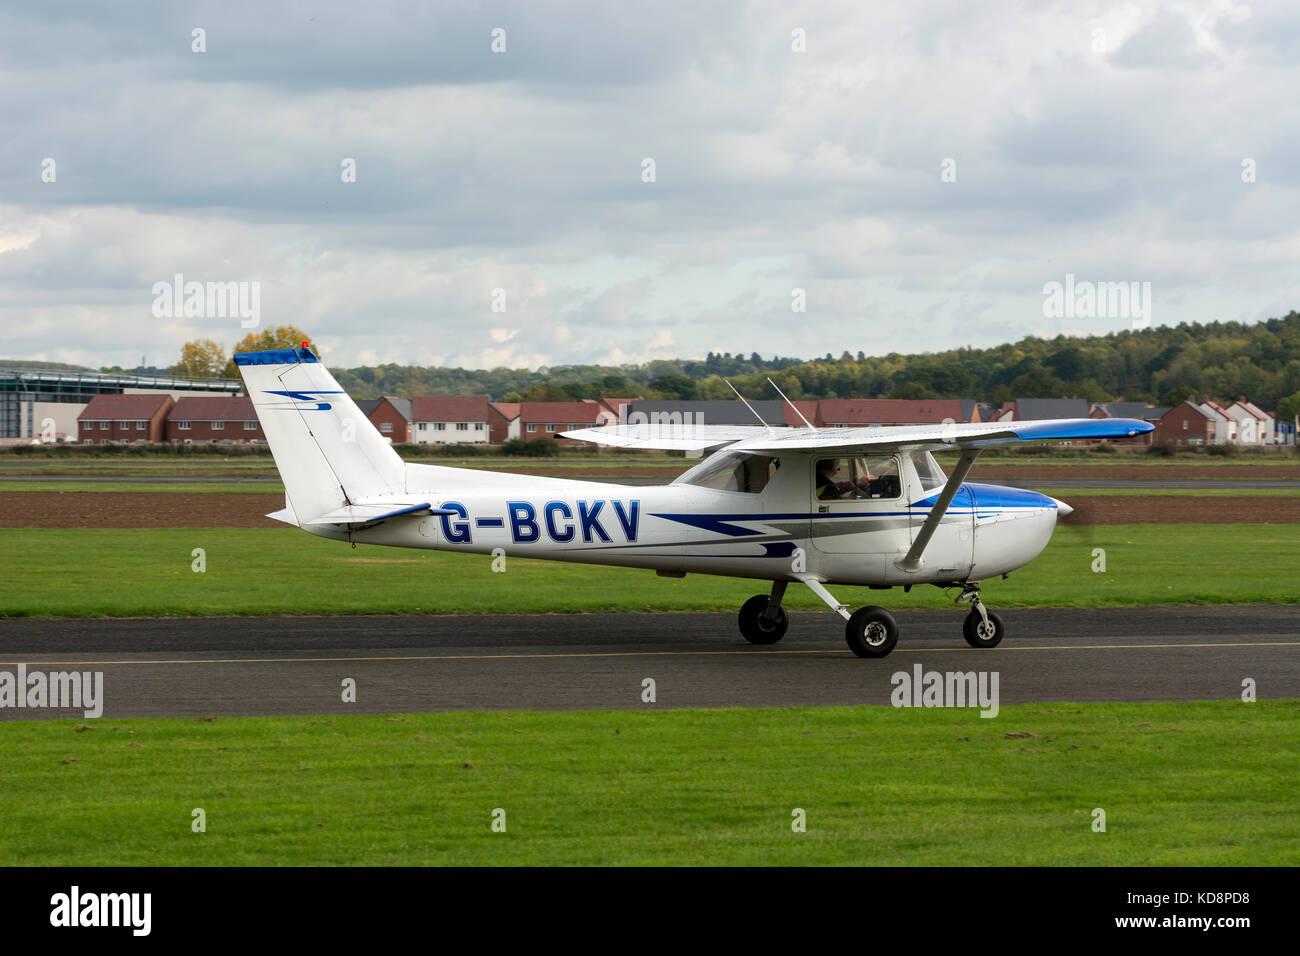 Reims Cessna FRA-150L at Wellesbourne Airfield, Warwickshire, UK (G-BCKV) - Stock Image